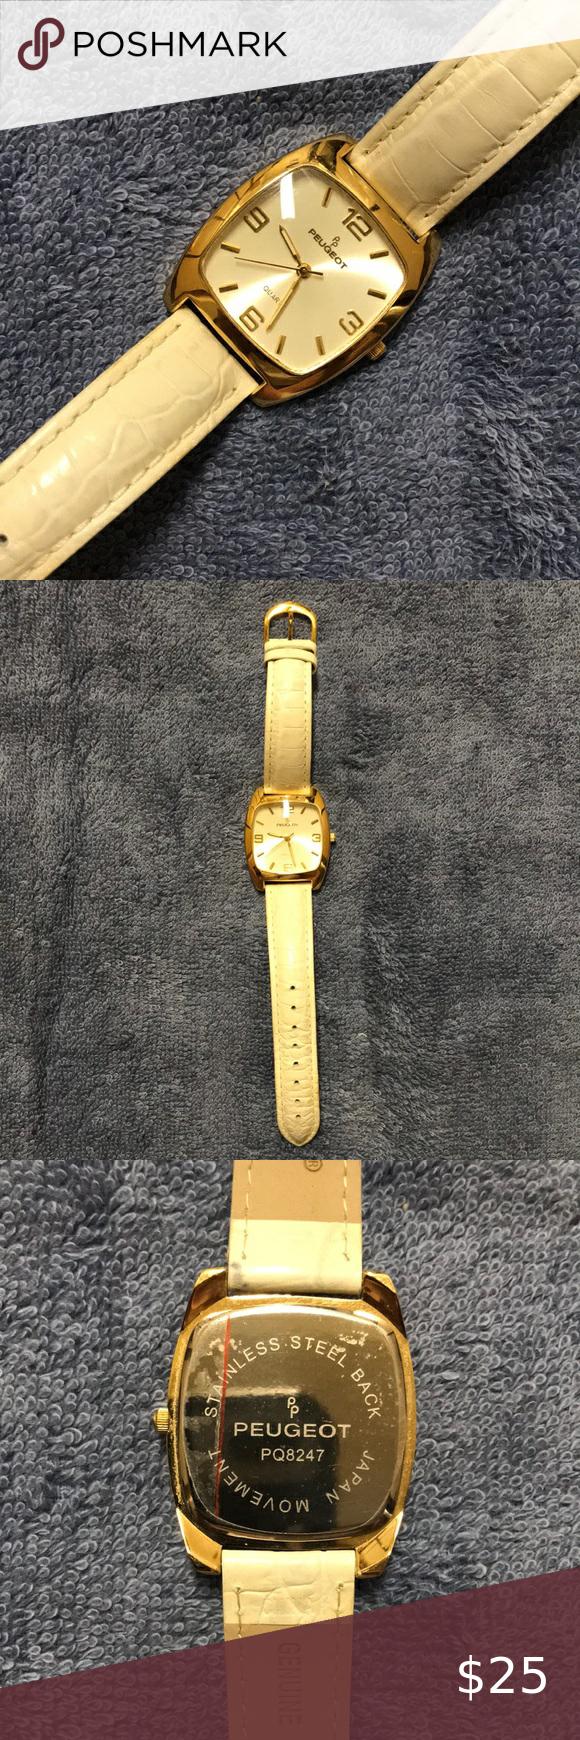 Peugeot Watch Watch Model Everyday Watch Women Accessories